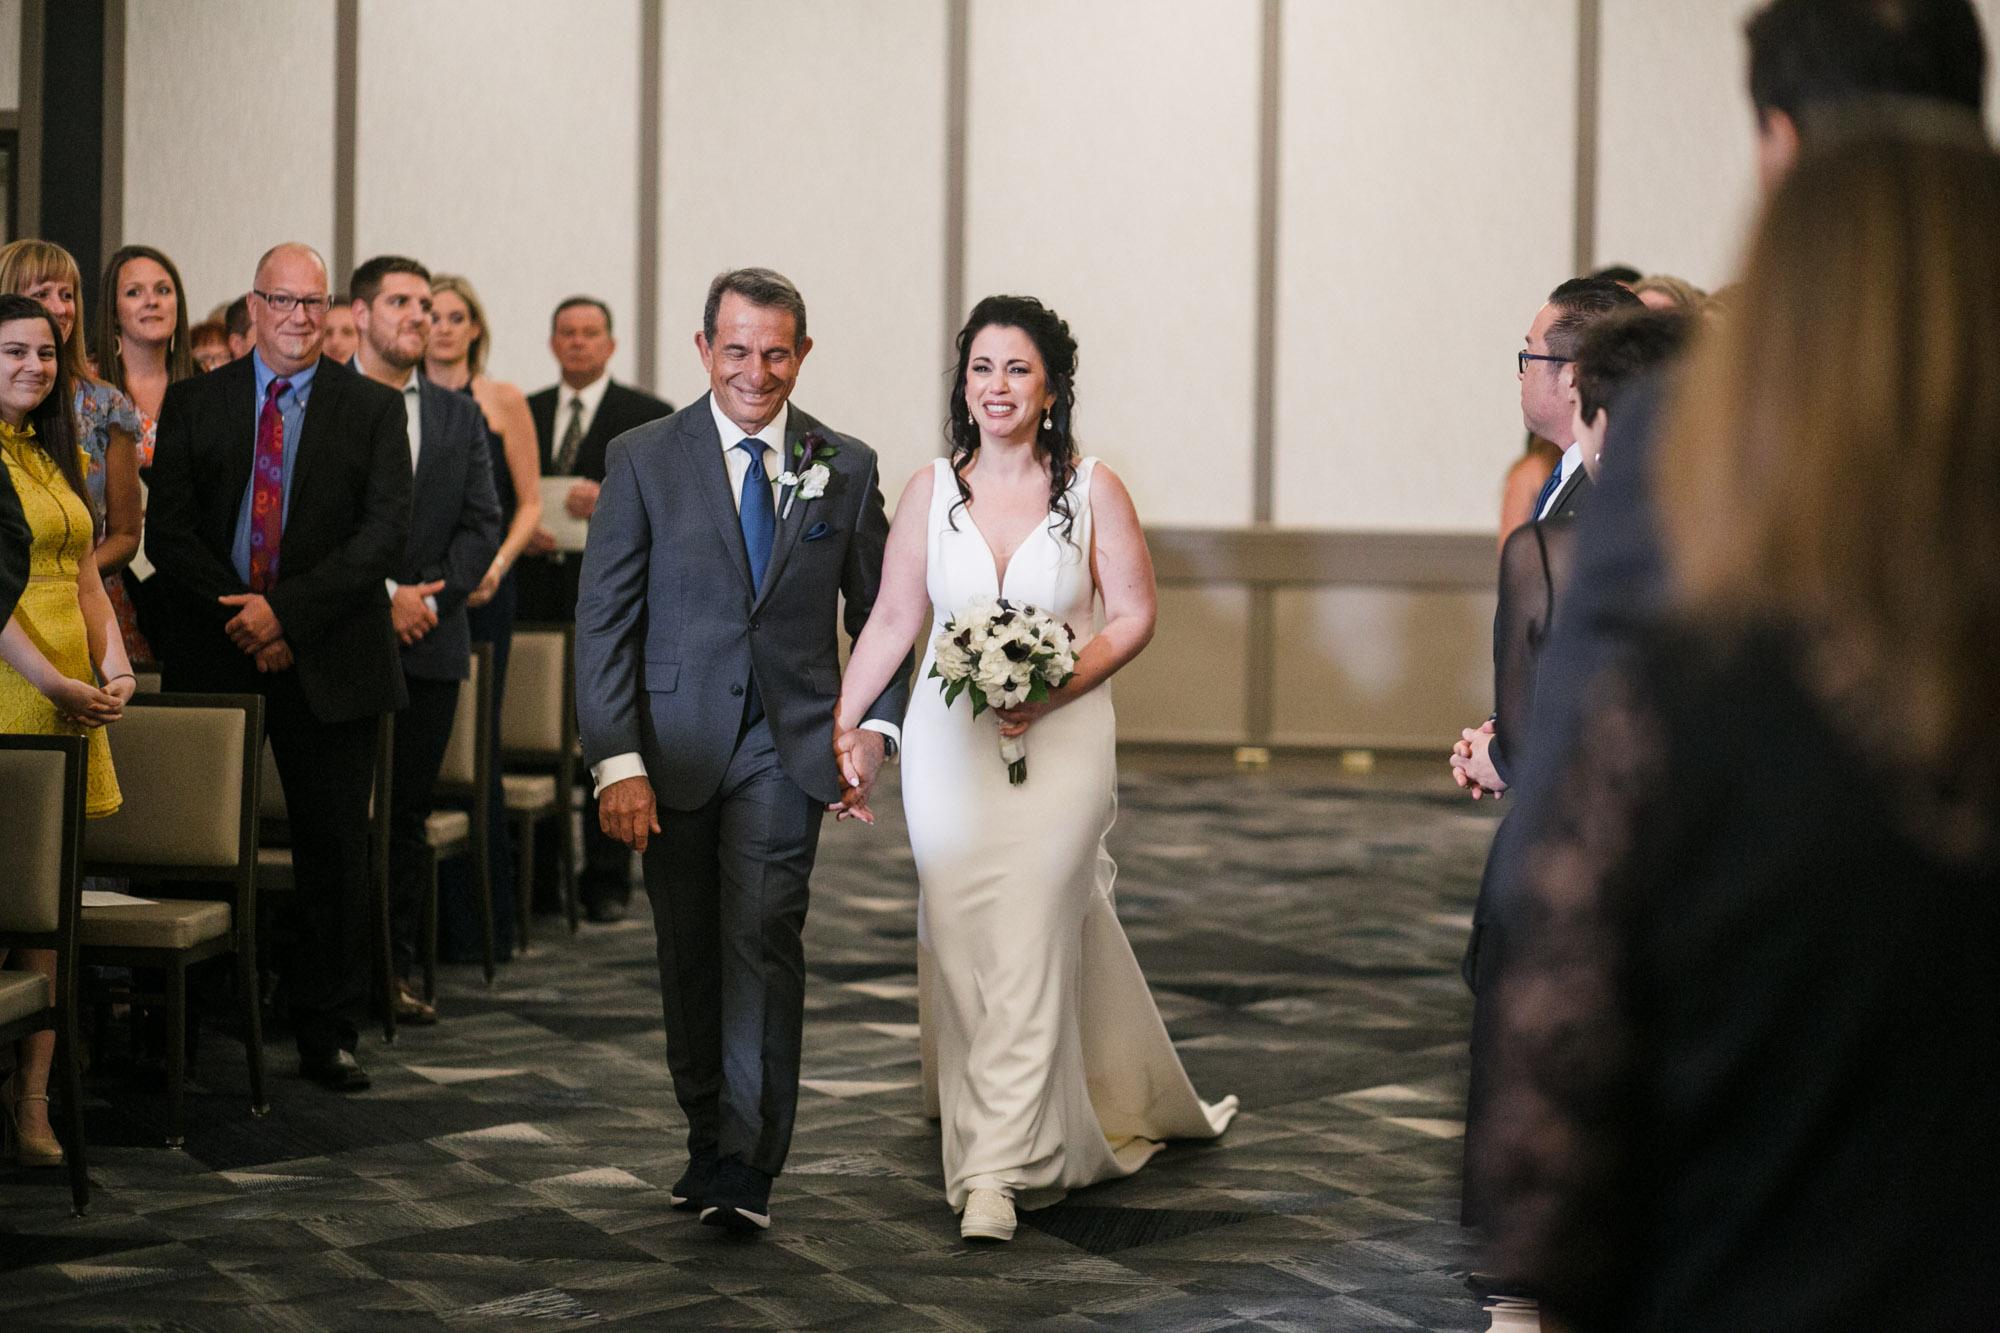 renaissance-hotel-toledo-wedding-72.jpg